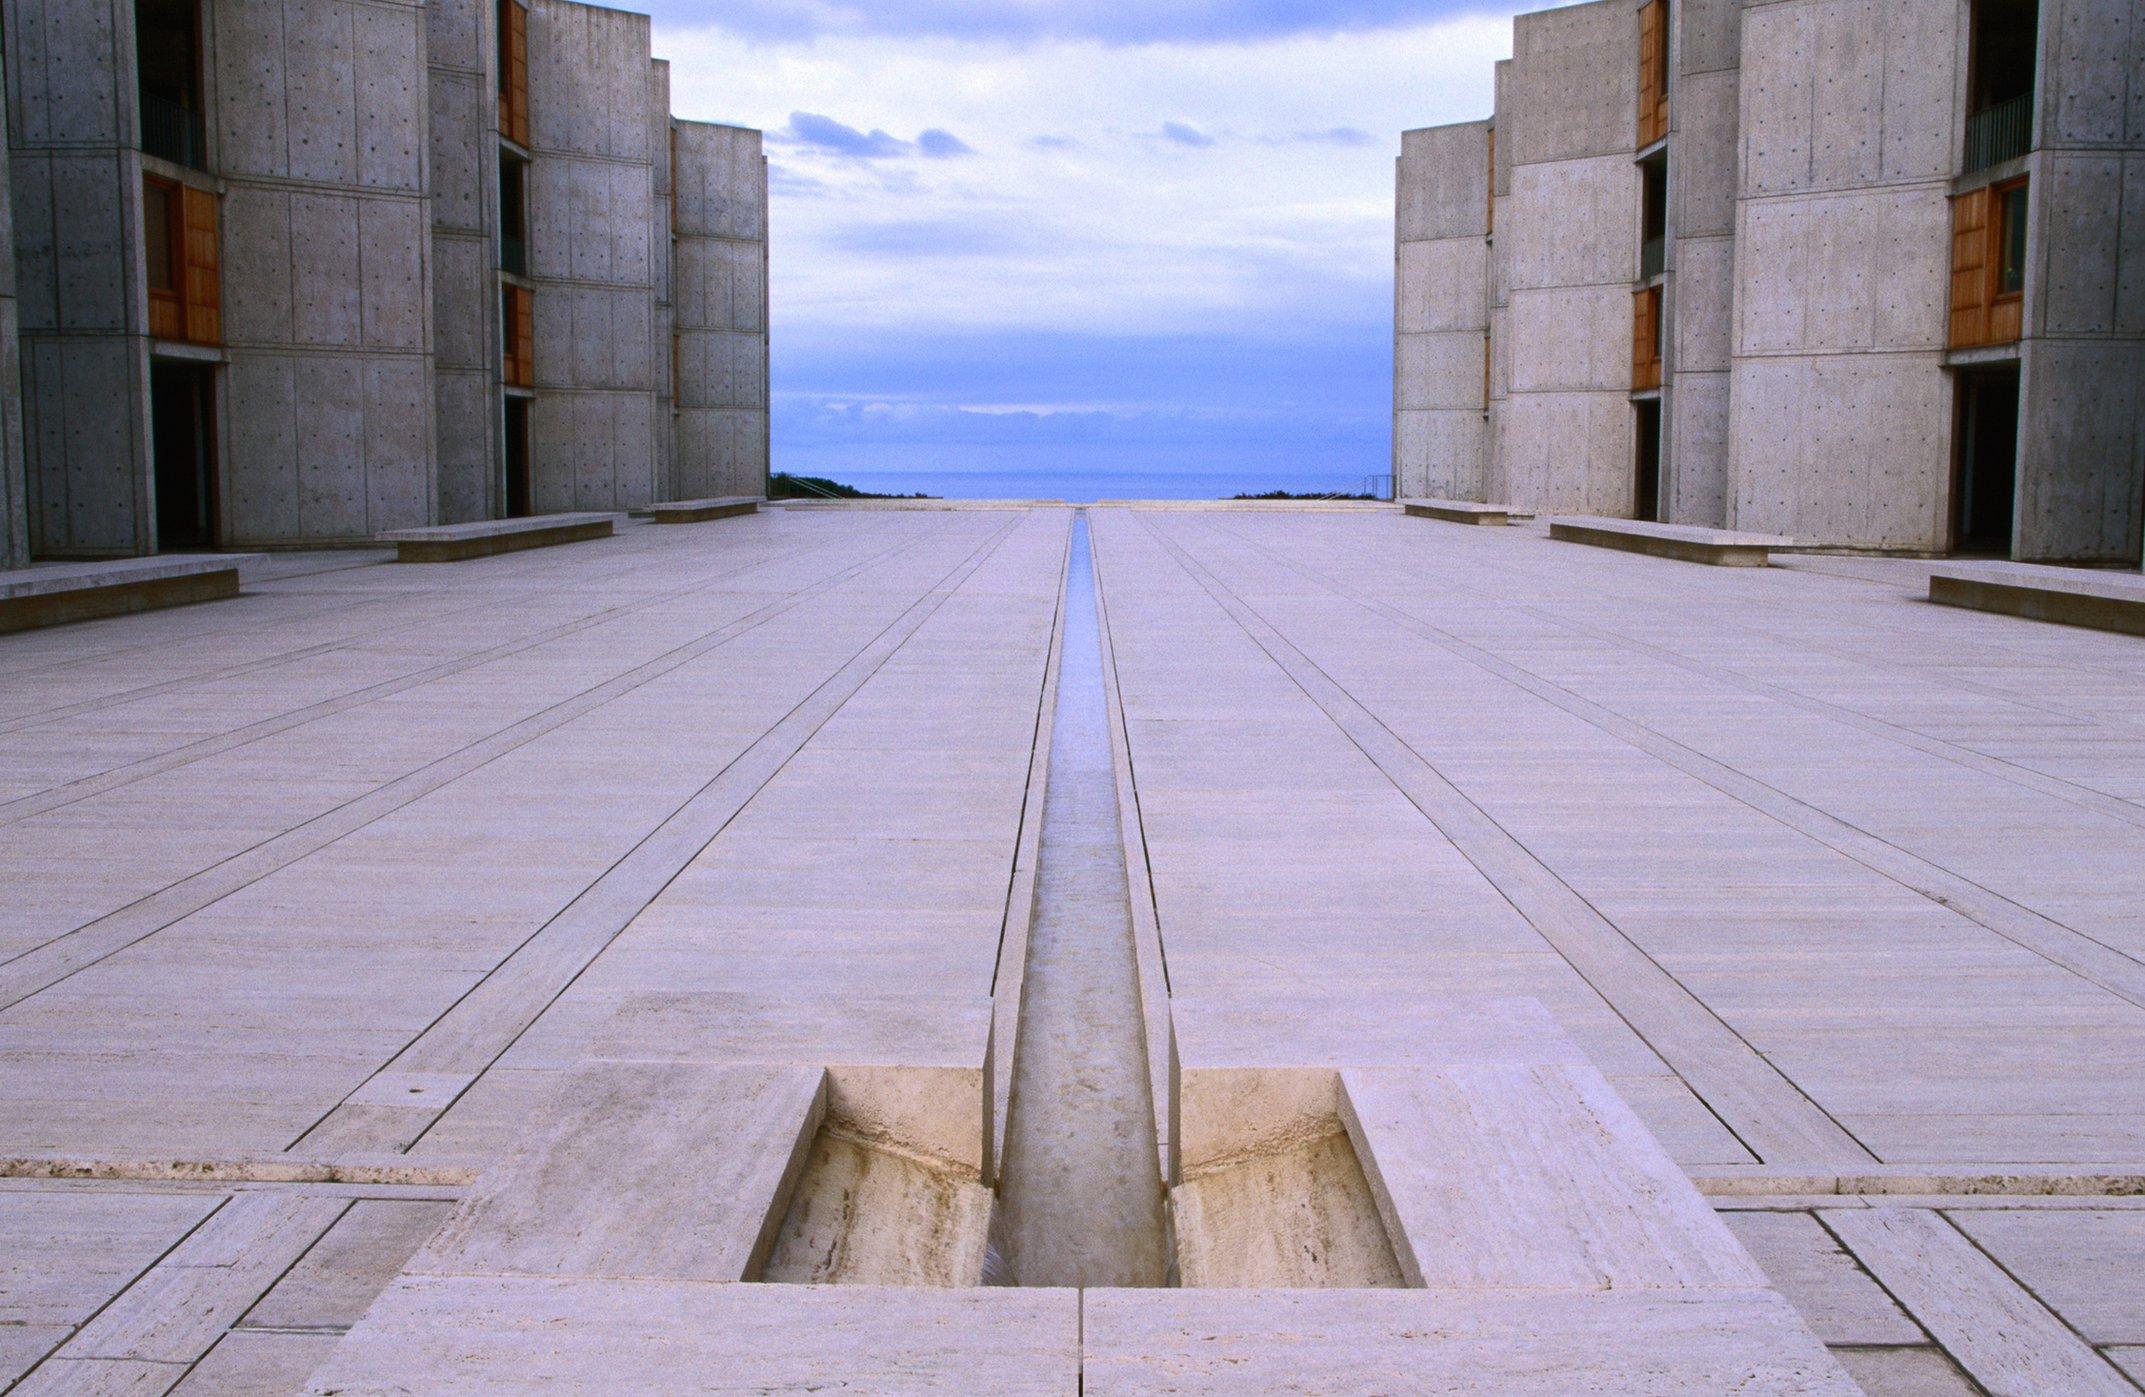 Instituto Salk, La Jolla, California